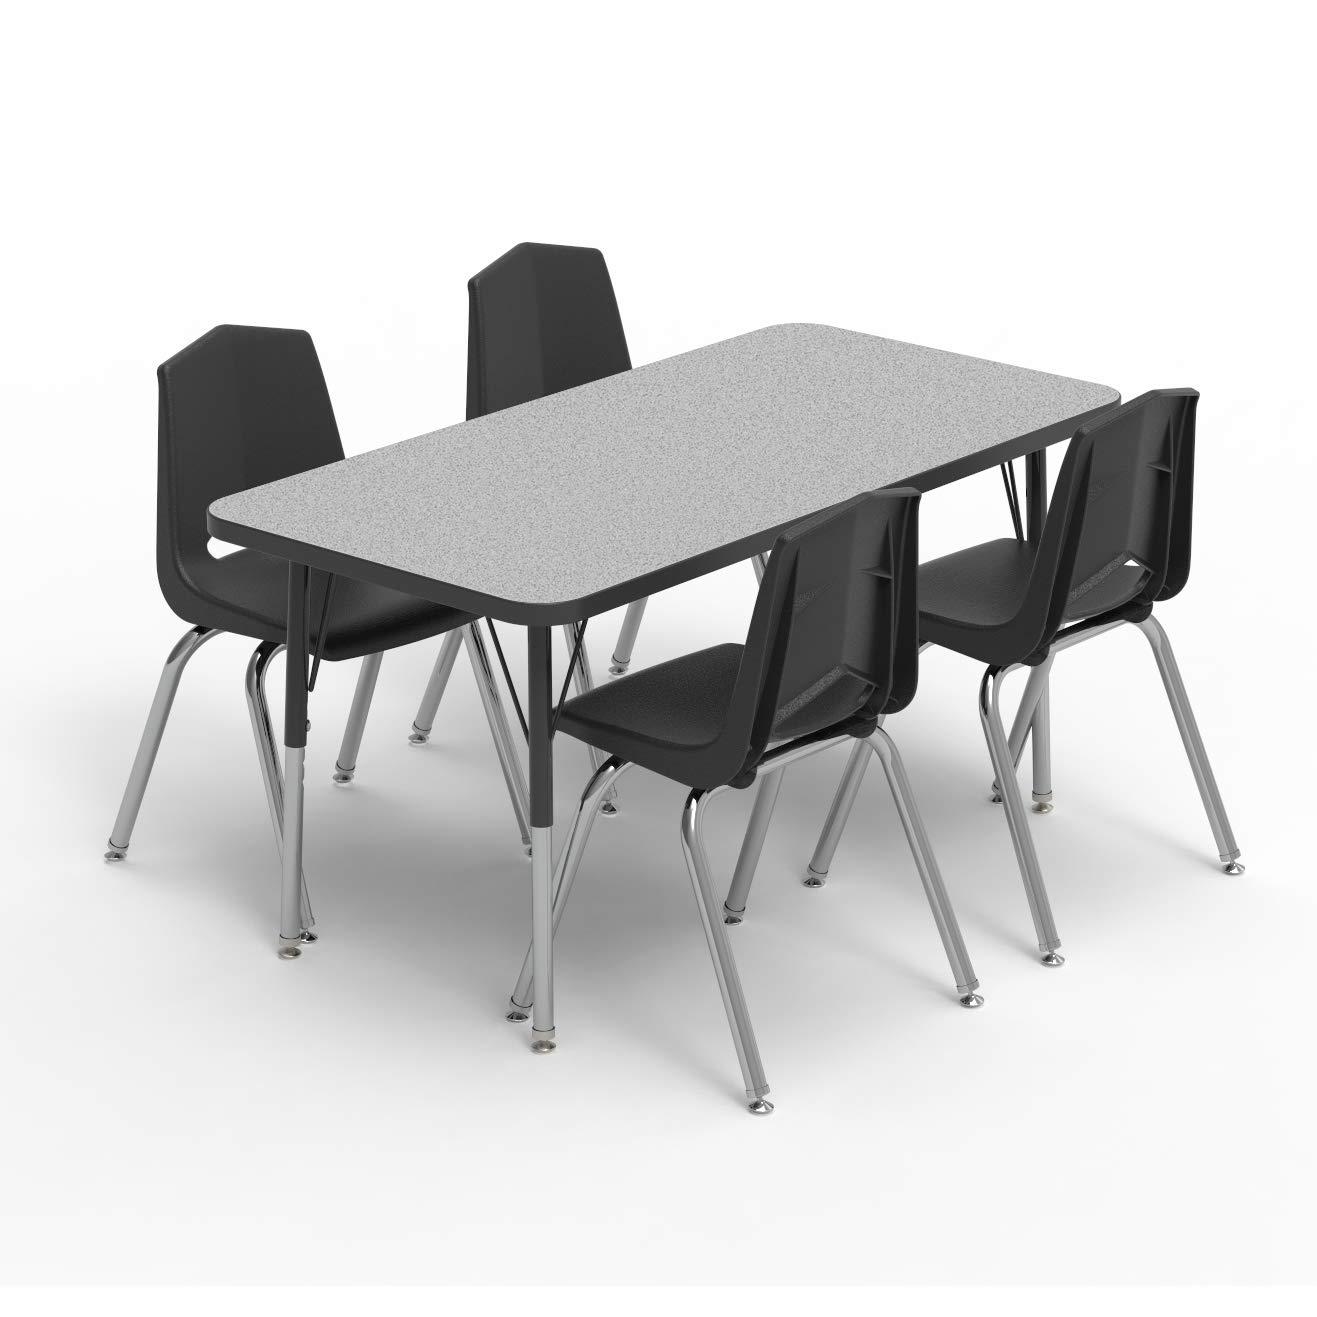 21-30 Marco Group MGA2224-50-BBLK 24 x 36 Rectangular Adjustable Height Classroom Activity Tables Black-Leg Fusion Maple -Top Standard Size Black-Edge